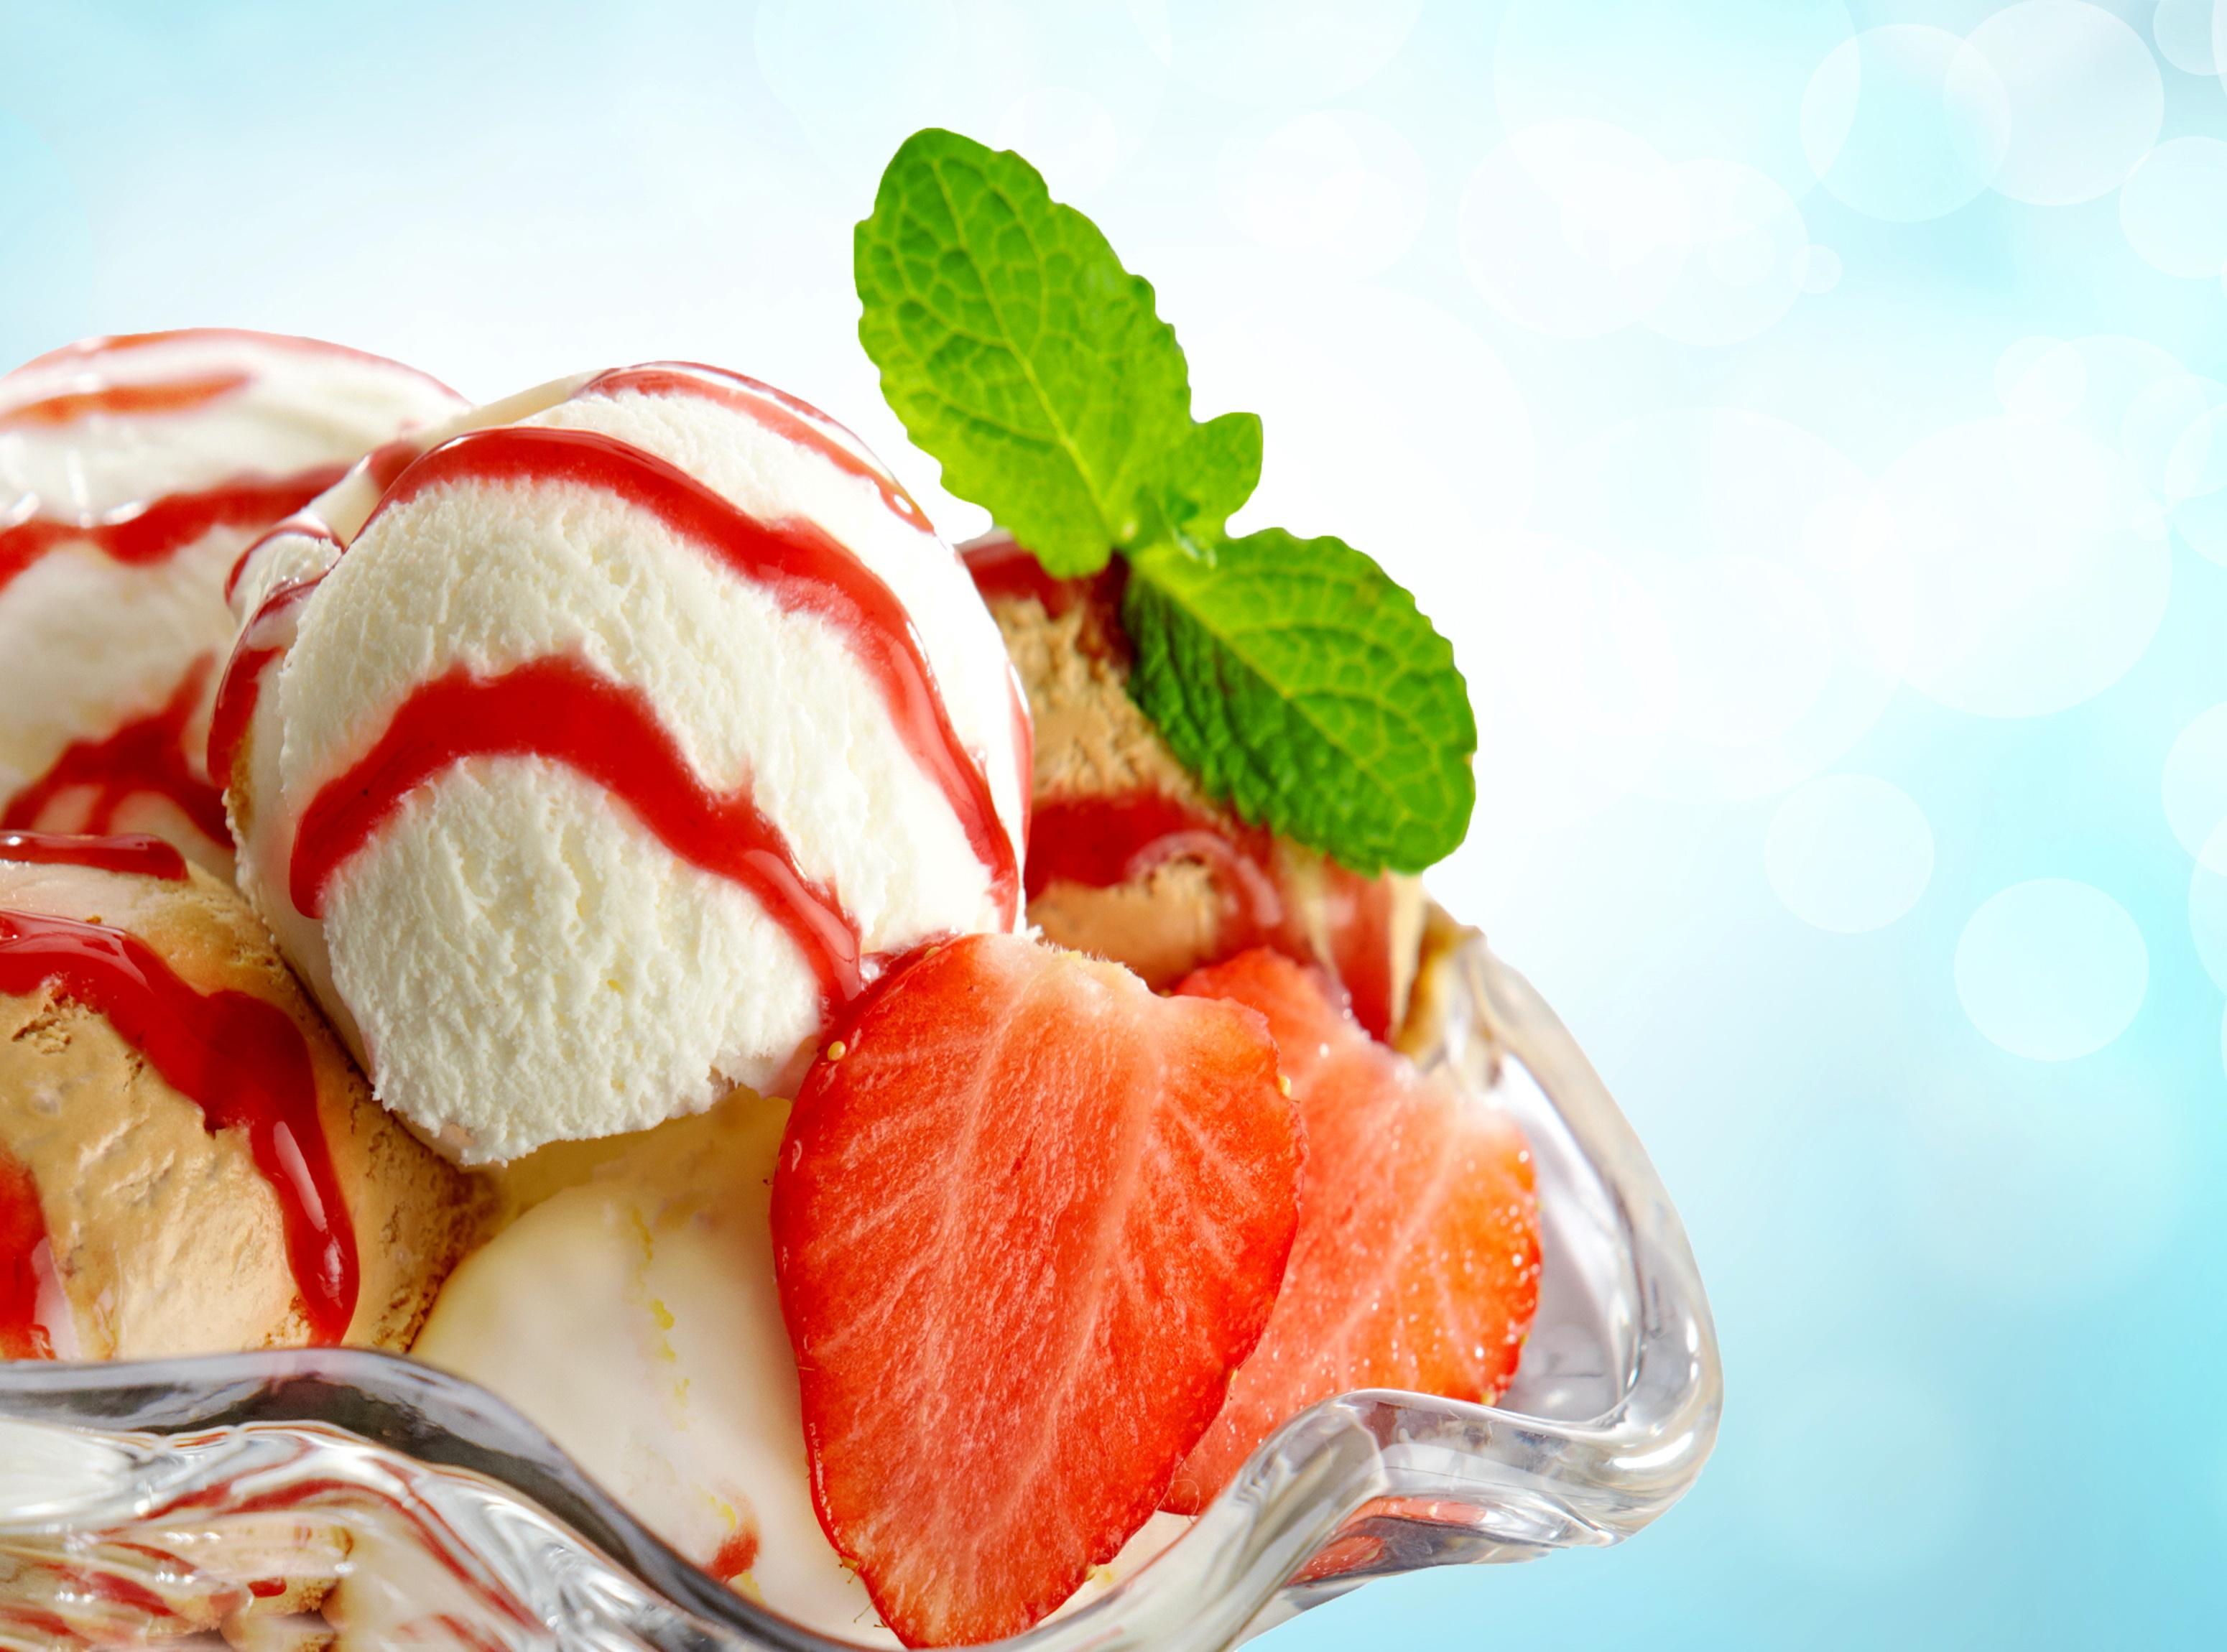 Ice Cream Wallpaper HD - WallpaperSafari: https://wallpapersafari.com/ice-cream-wallpaper-hd/